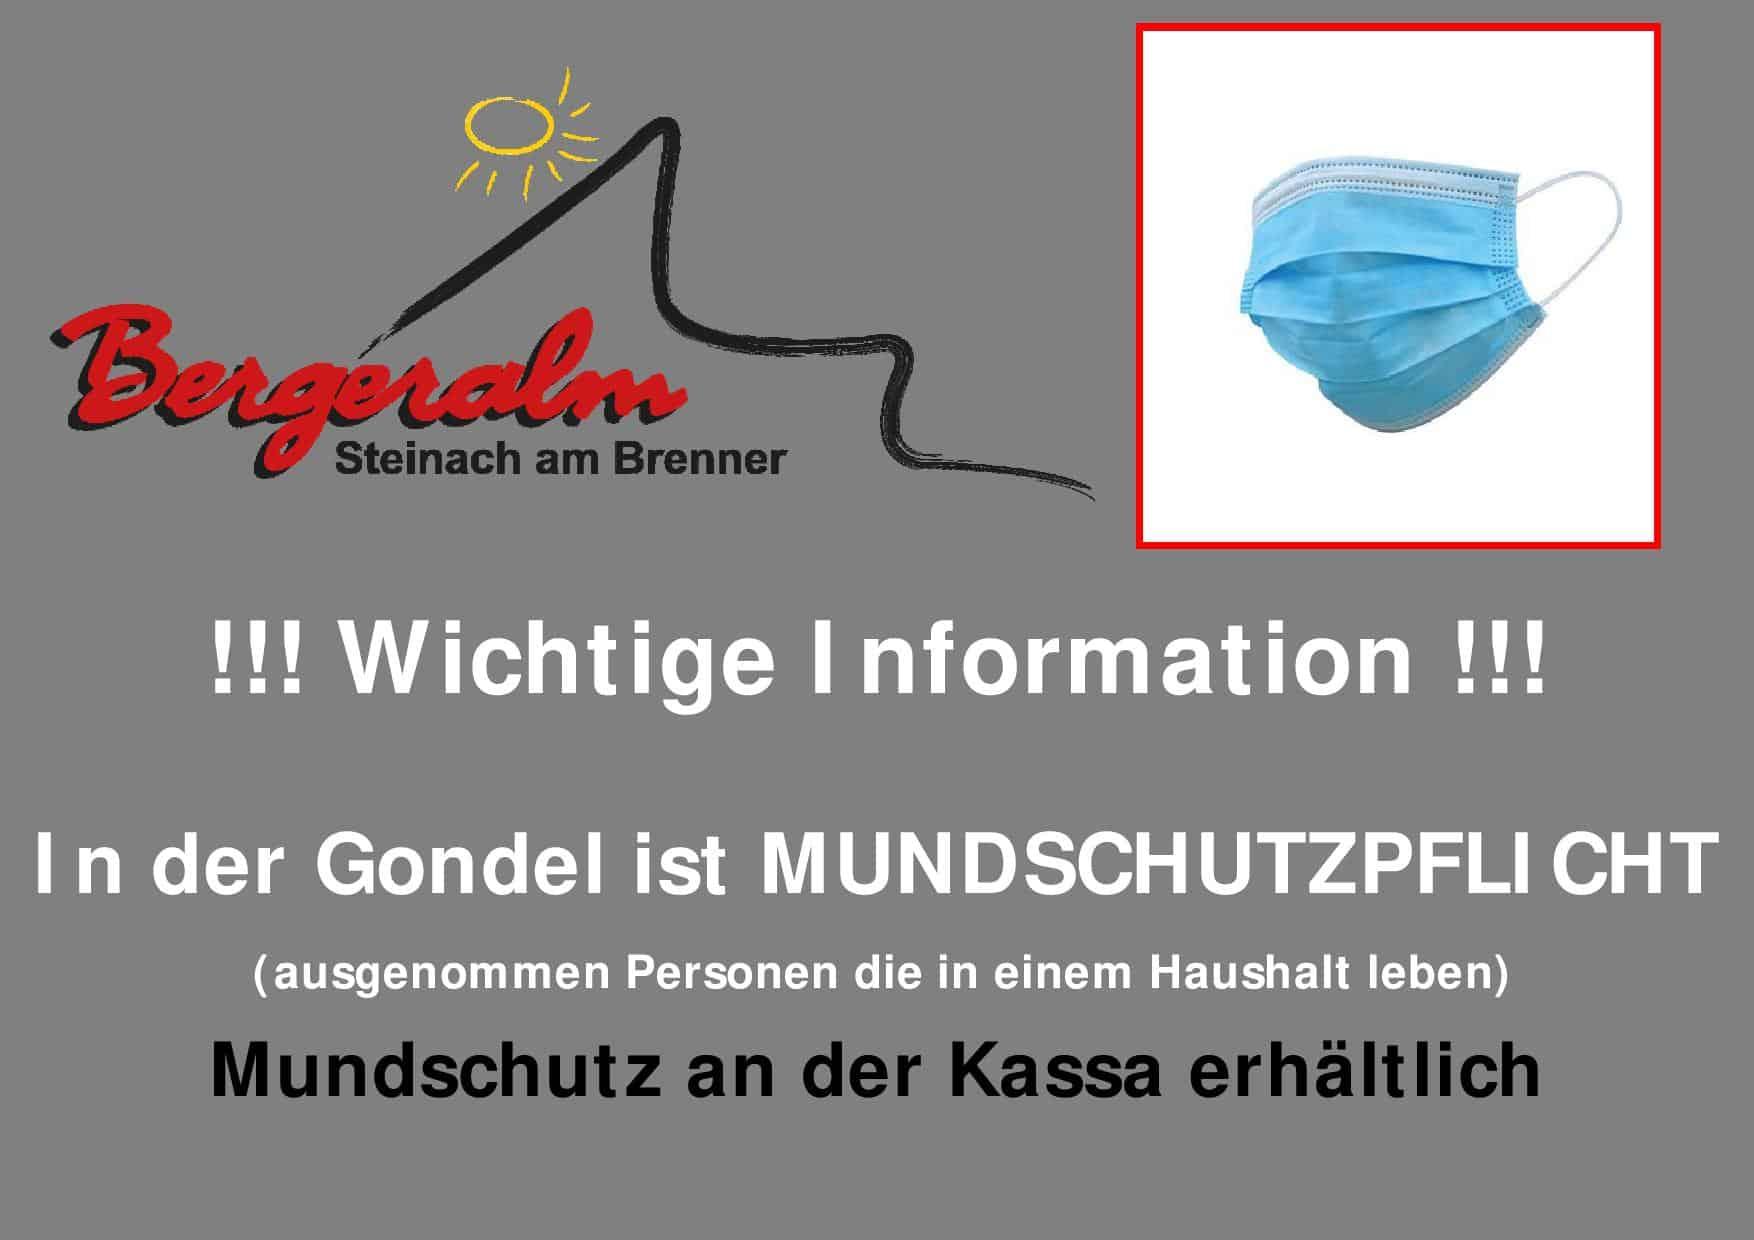 Steinach am Brenner - Thema auf bubble-sheet.com